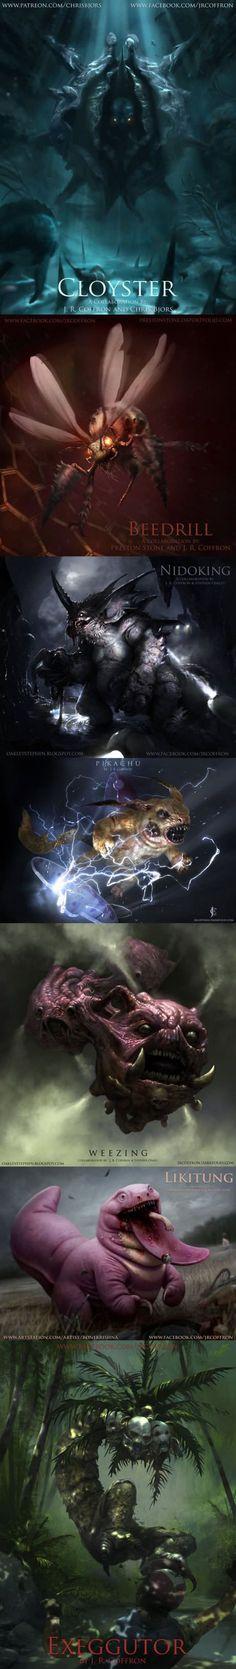 Poke Monstrosities (By JRCoffronIII) | Pokemon as they would look in real life | Pokemon Monsters Fan art | Creepy, horror, fantasy creatures | anime |  Cloyster Beedrill Nidoking Pikachu Weezing Likitung Exeggutor